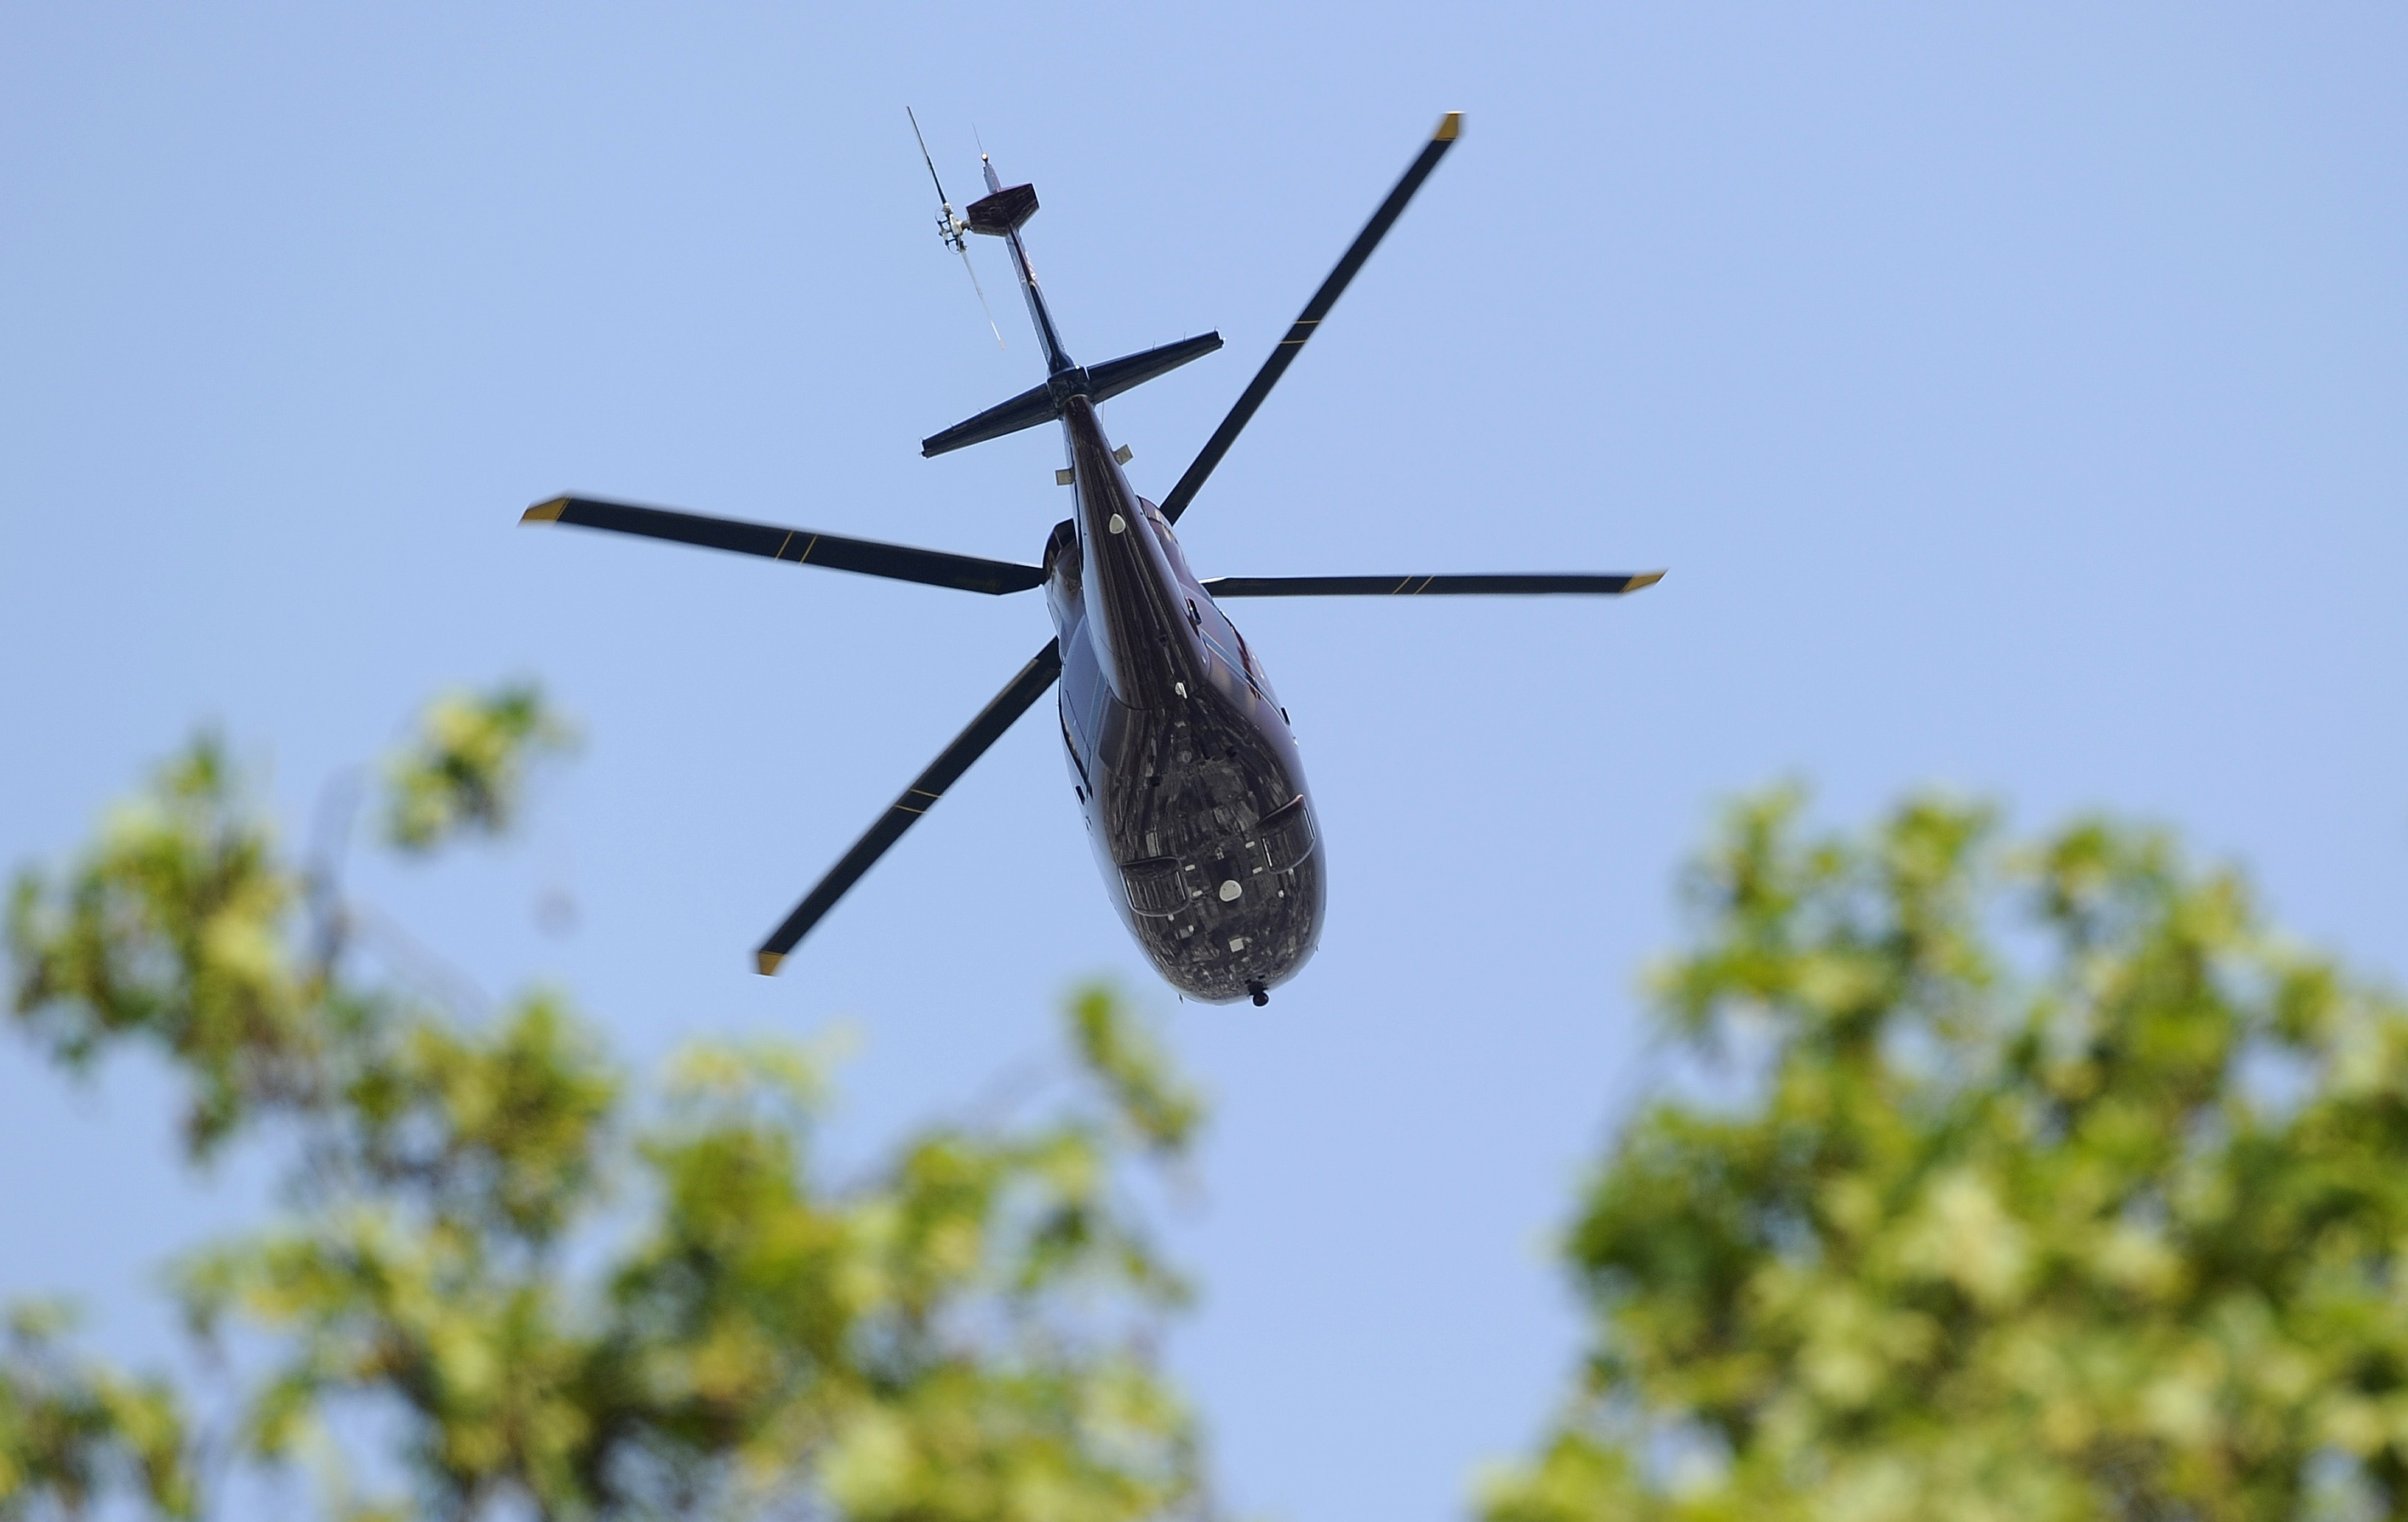 http://www.tlife.gr/files/Image/NEWS/2011/APRILIOS/30-04-2011/elikoptero.JPG